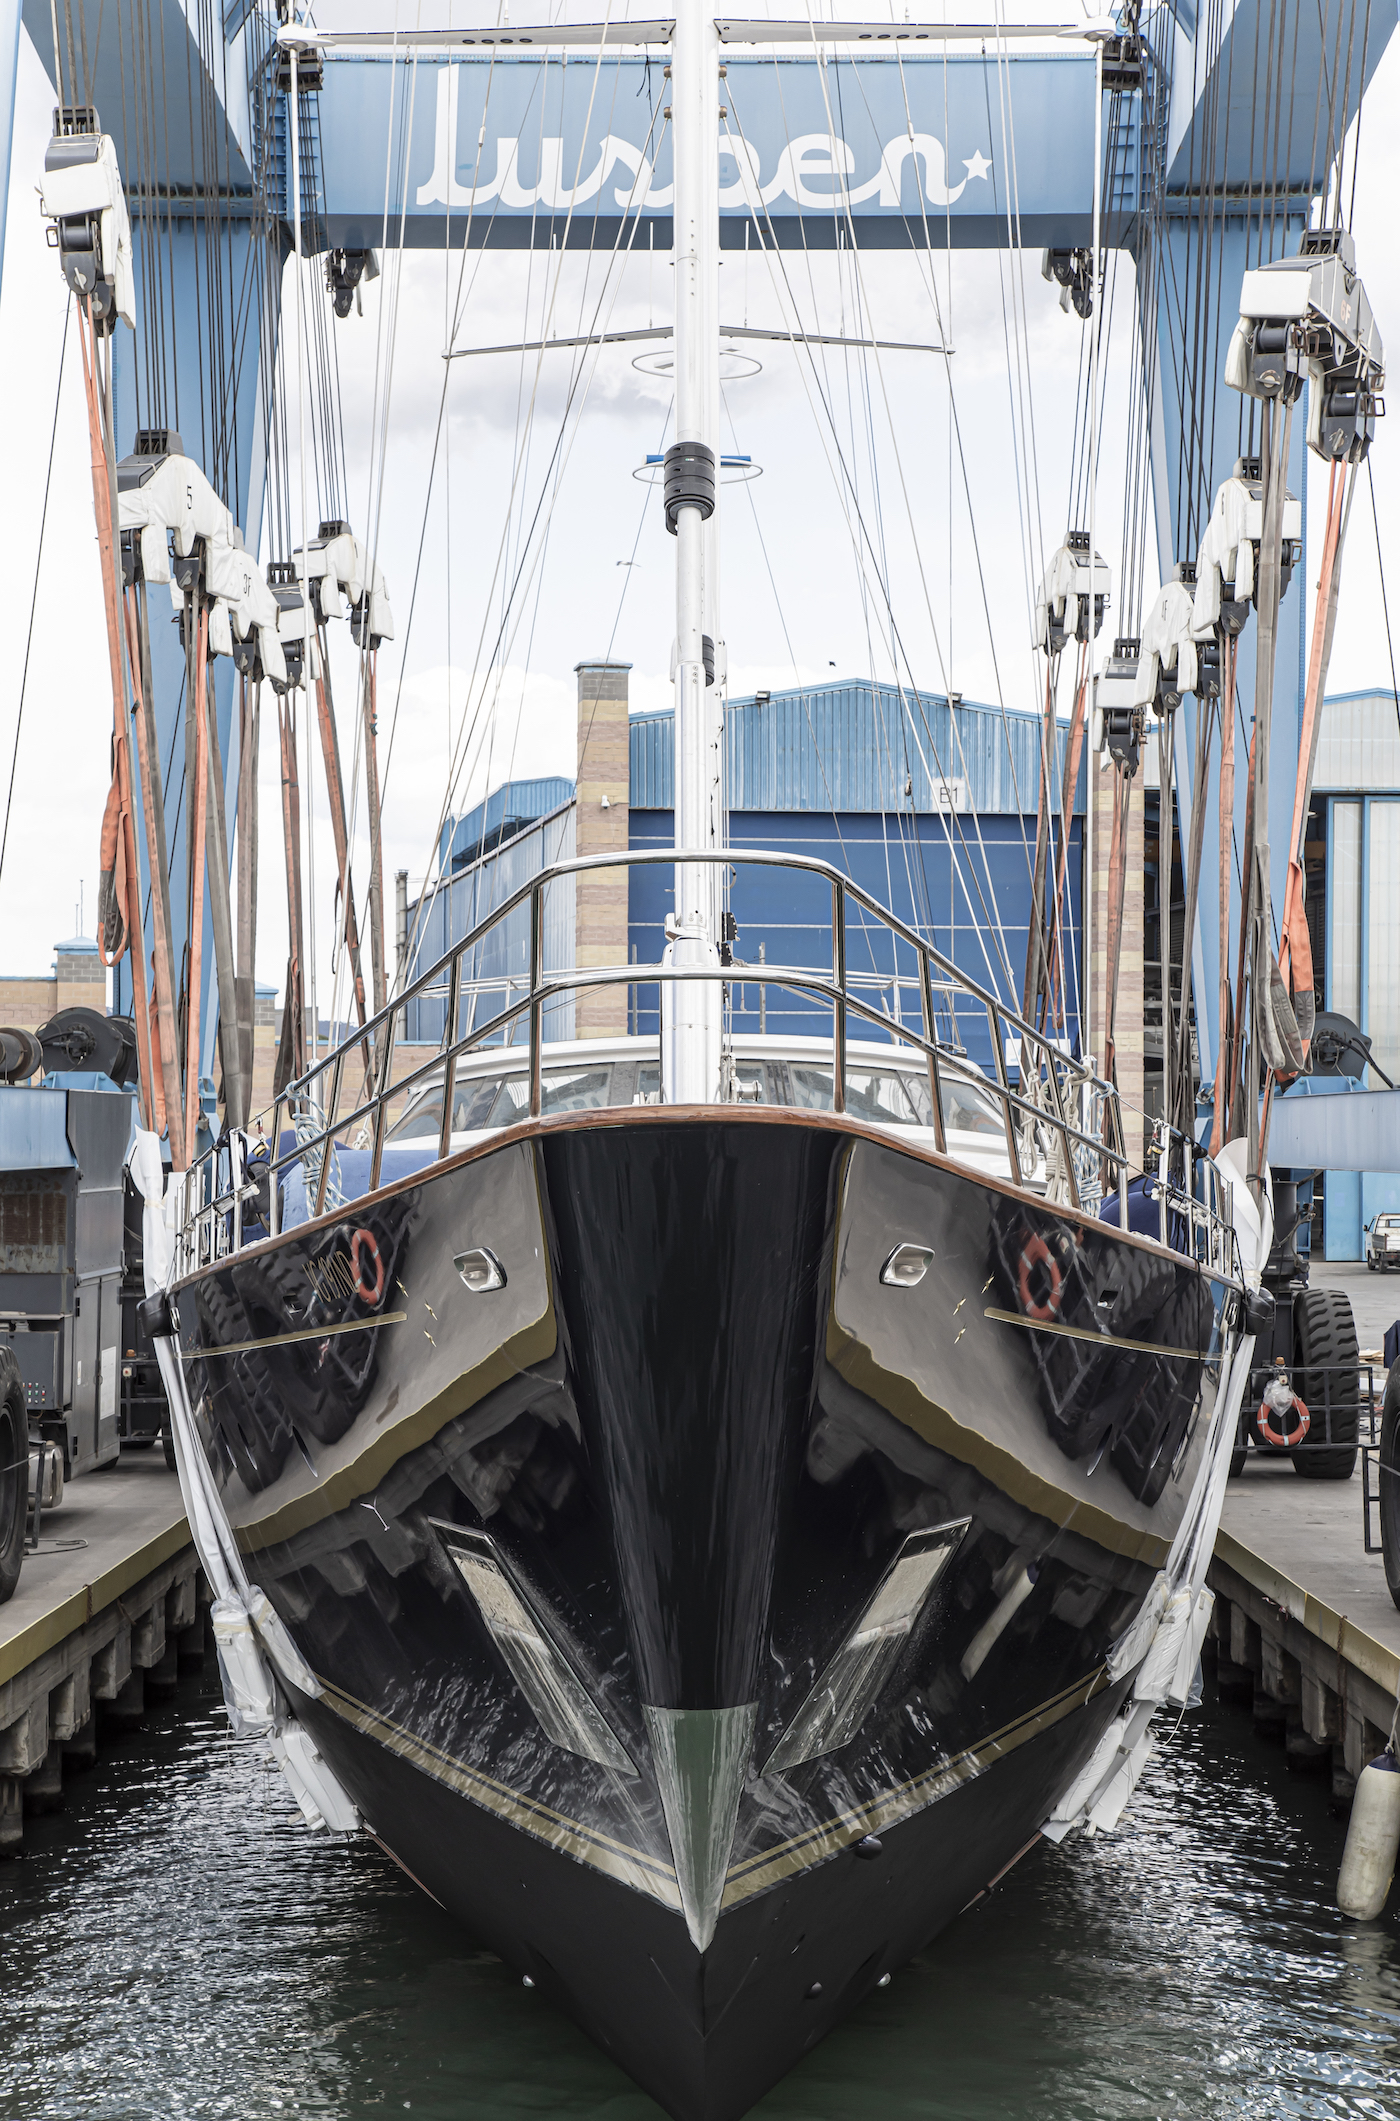 Morning Glory launch at Lusben shipyard - bow